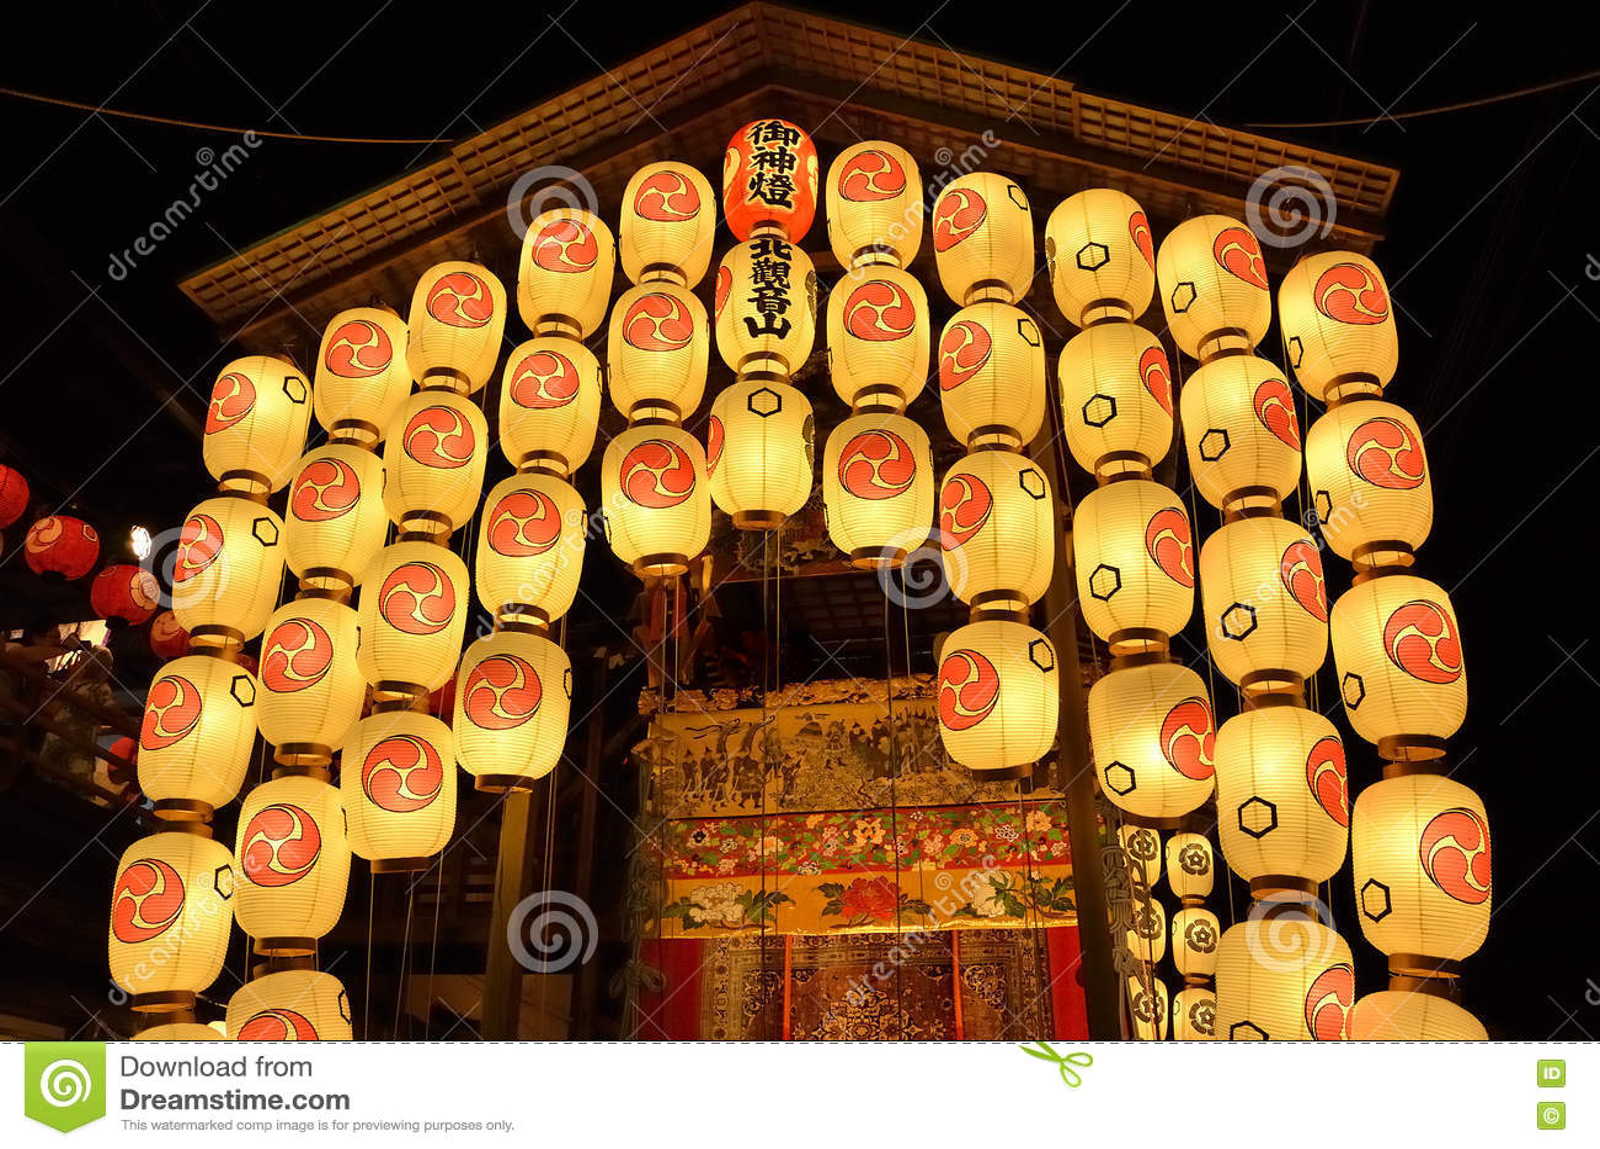 Lantaarns van Gion-festivalnacht, Kyoto Japan